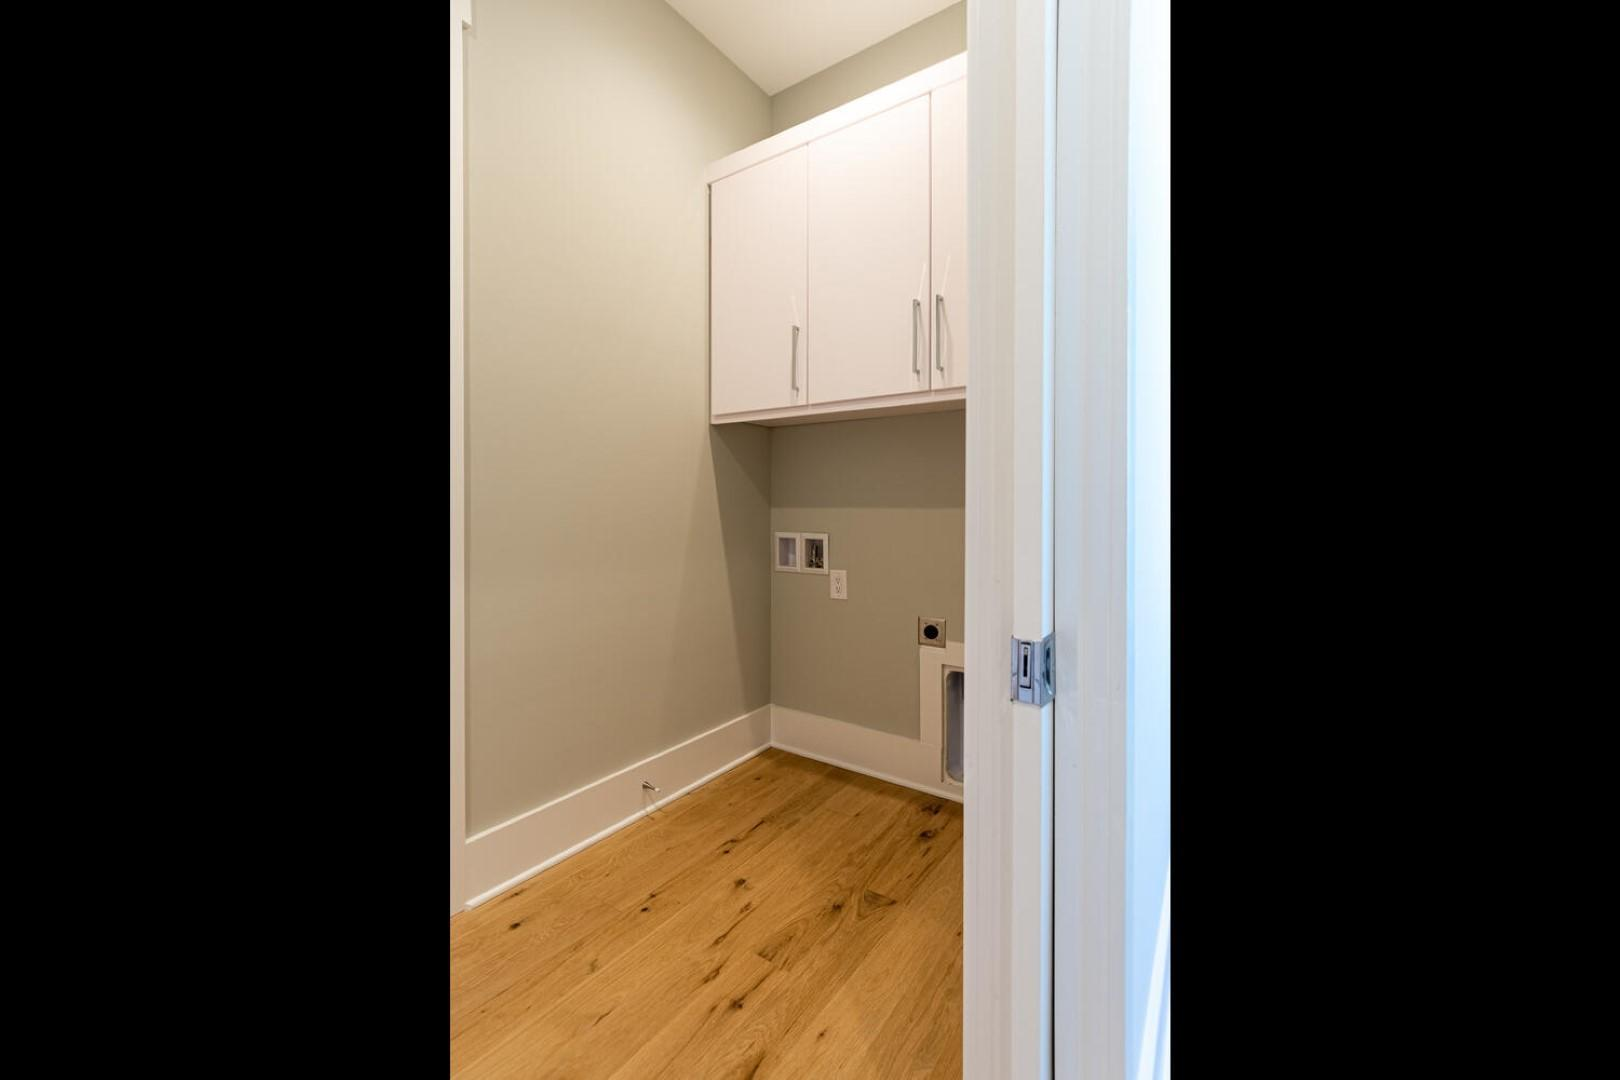 Scanlonville Homes For Sale - 156 5th, Mount Pleasant, SC - 34